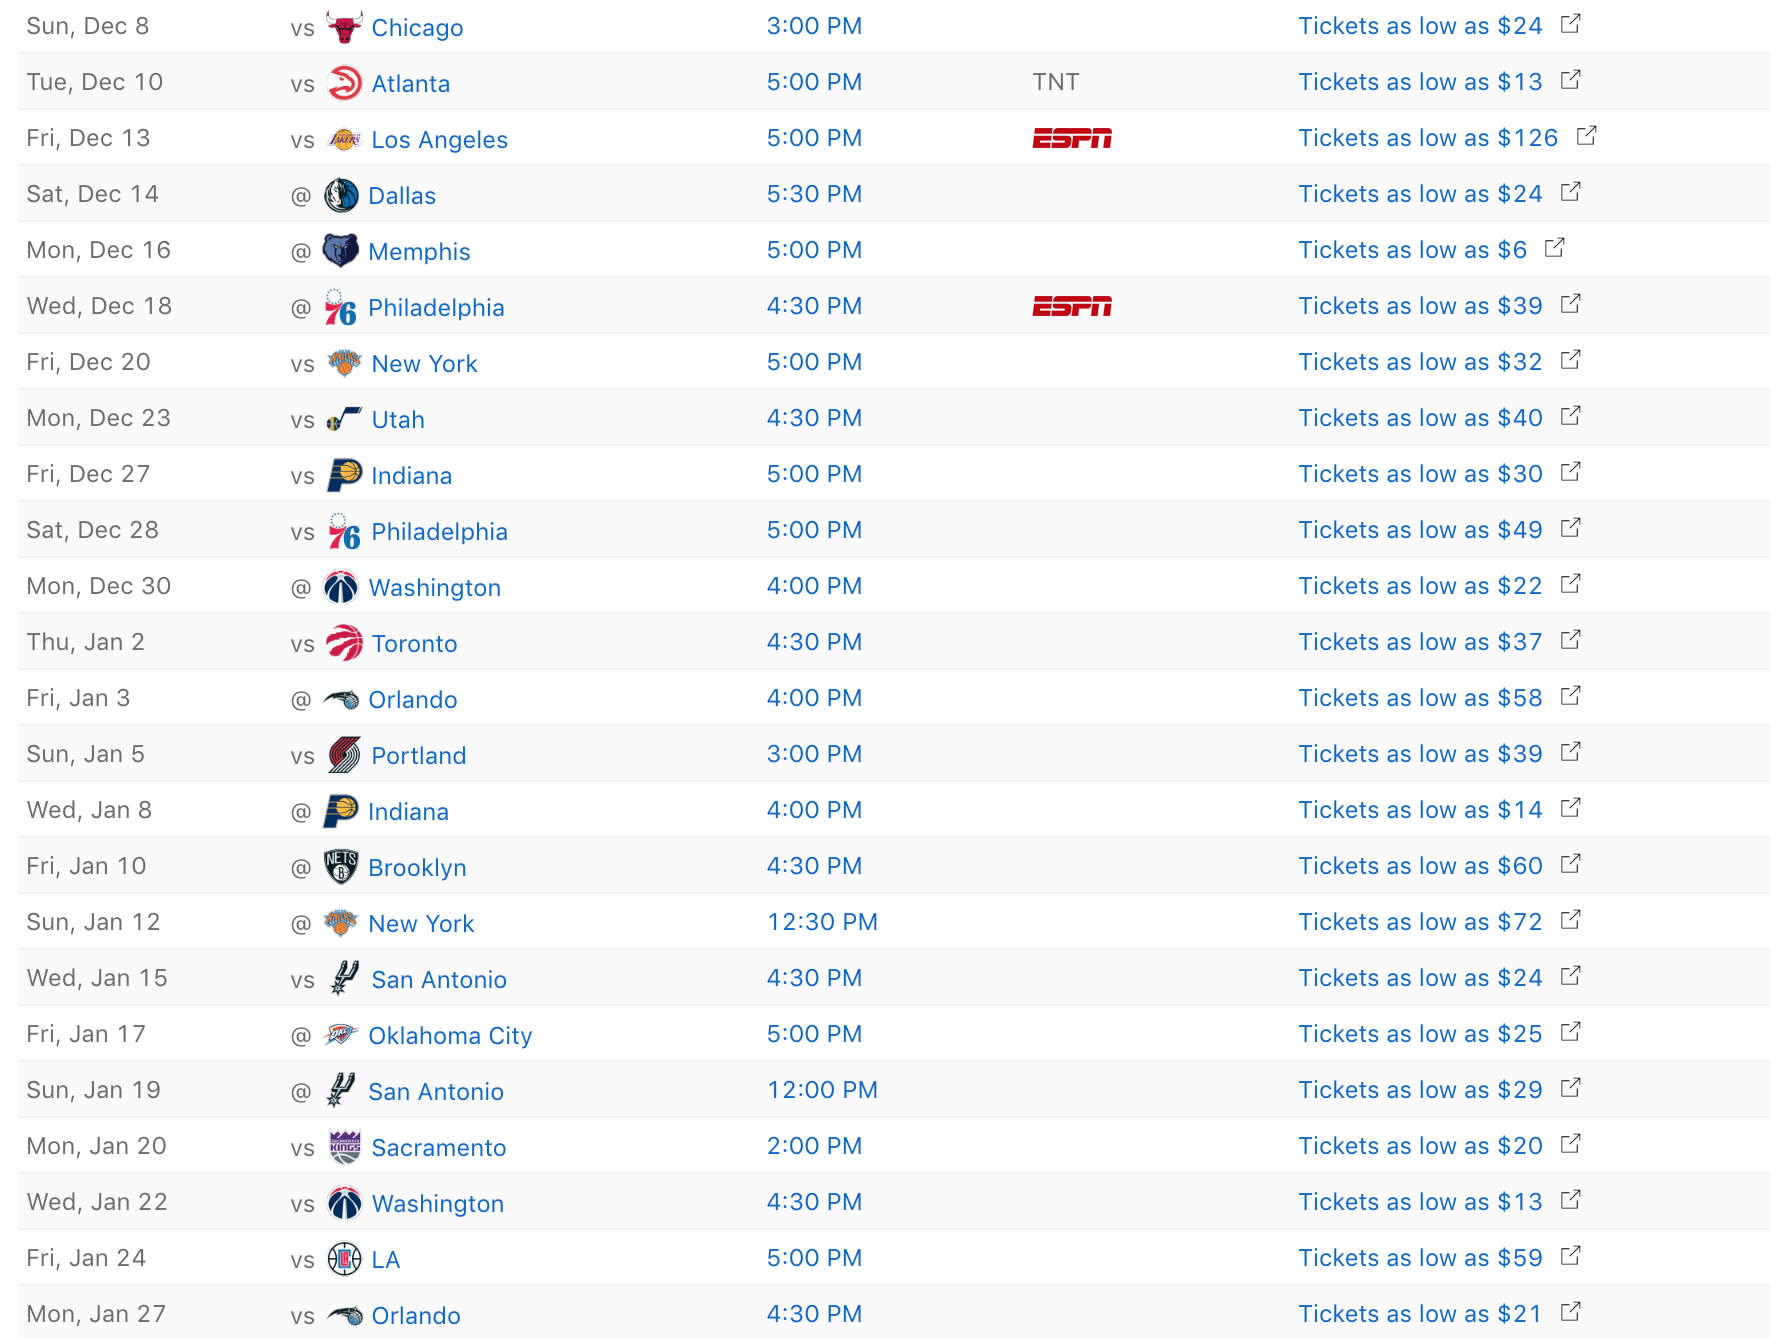 Miami Heat Schedule For 2019 20 Regular Season